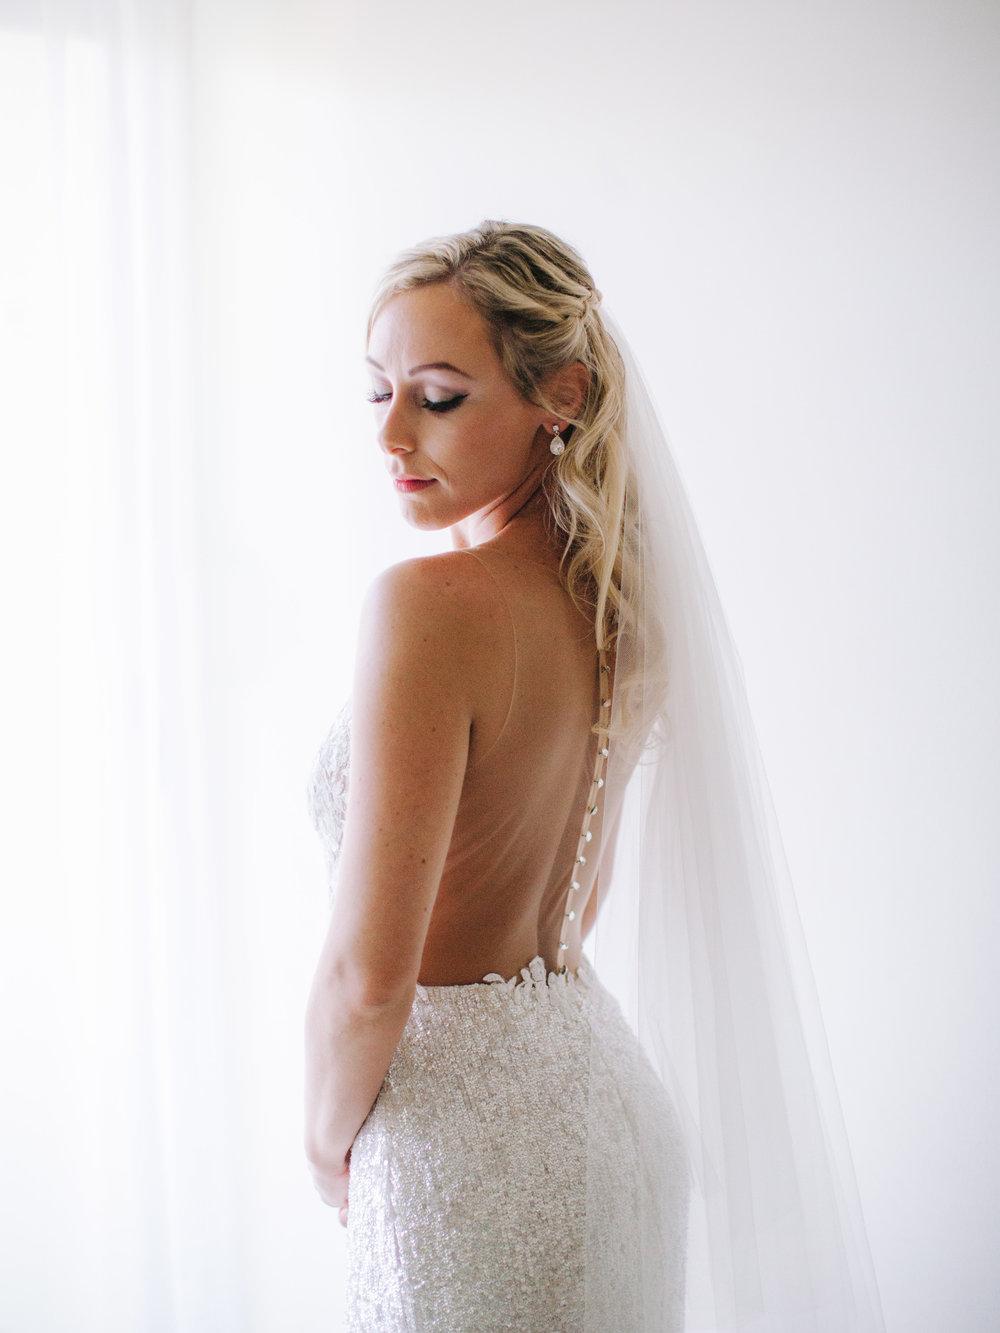 Kim_Jeff_Cancun Wedding_Getting_Ready_Kurtz_Orpia (72 of 105).jpg